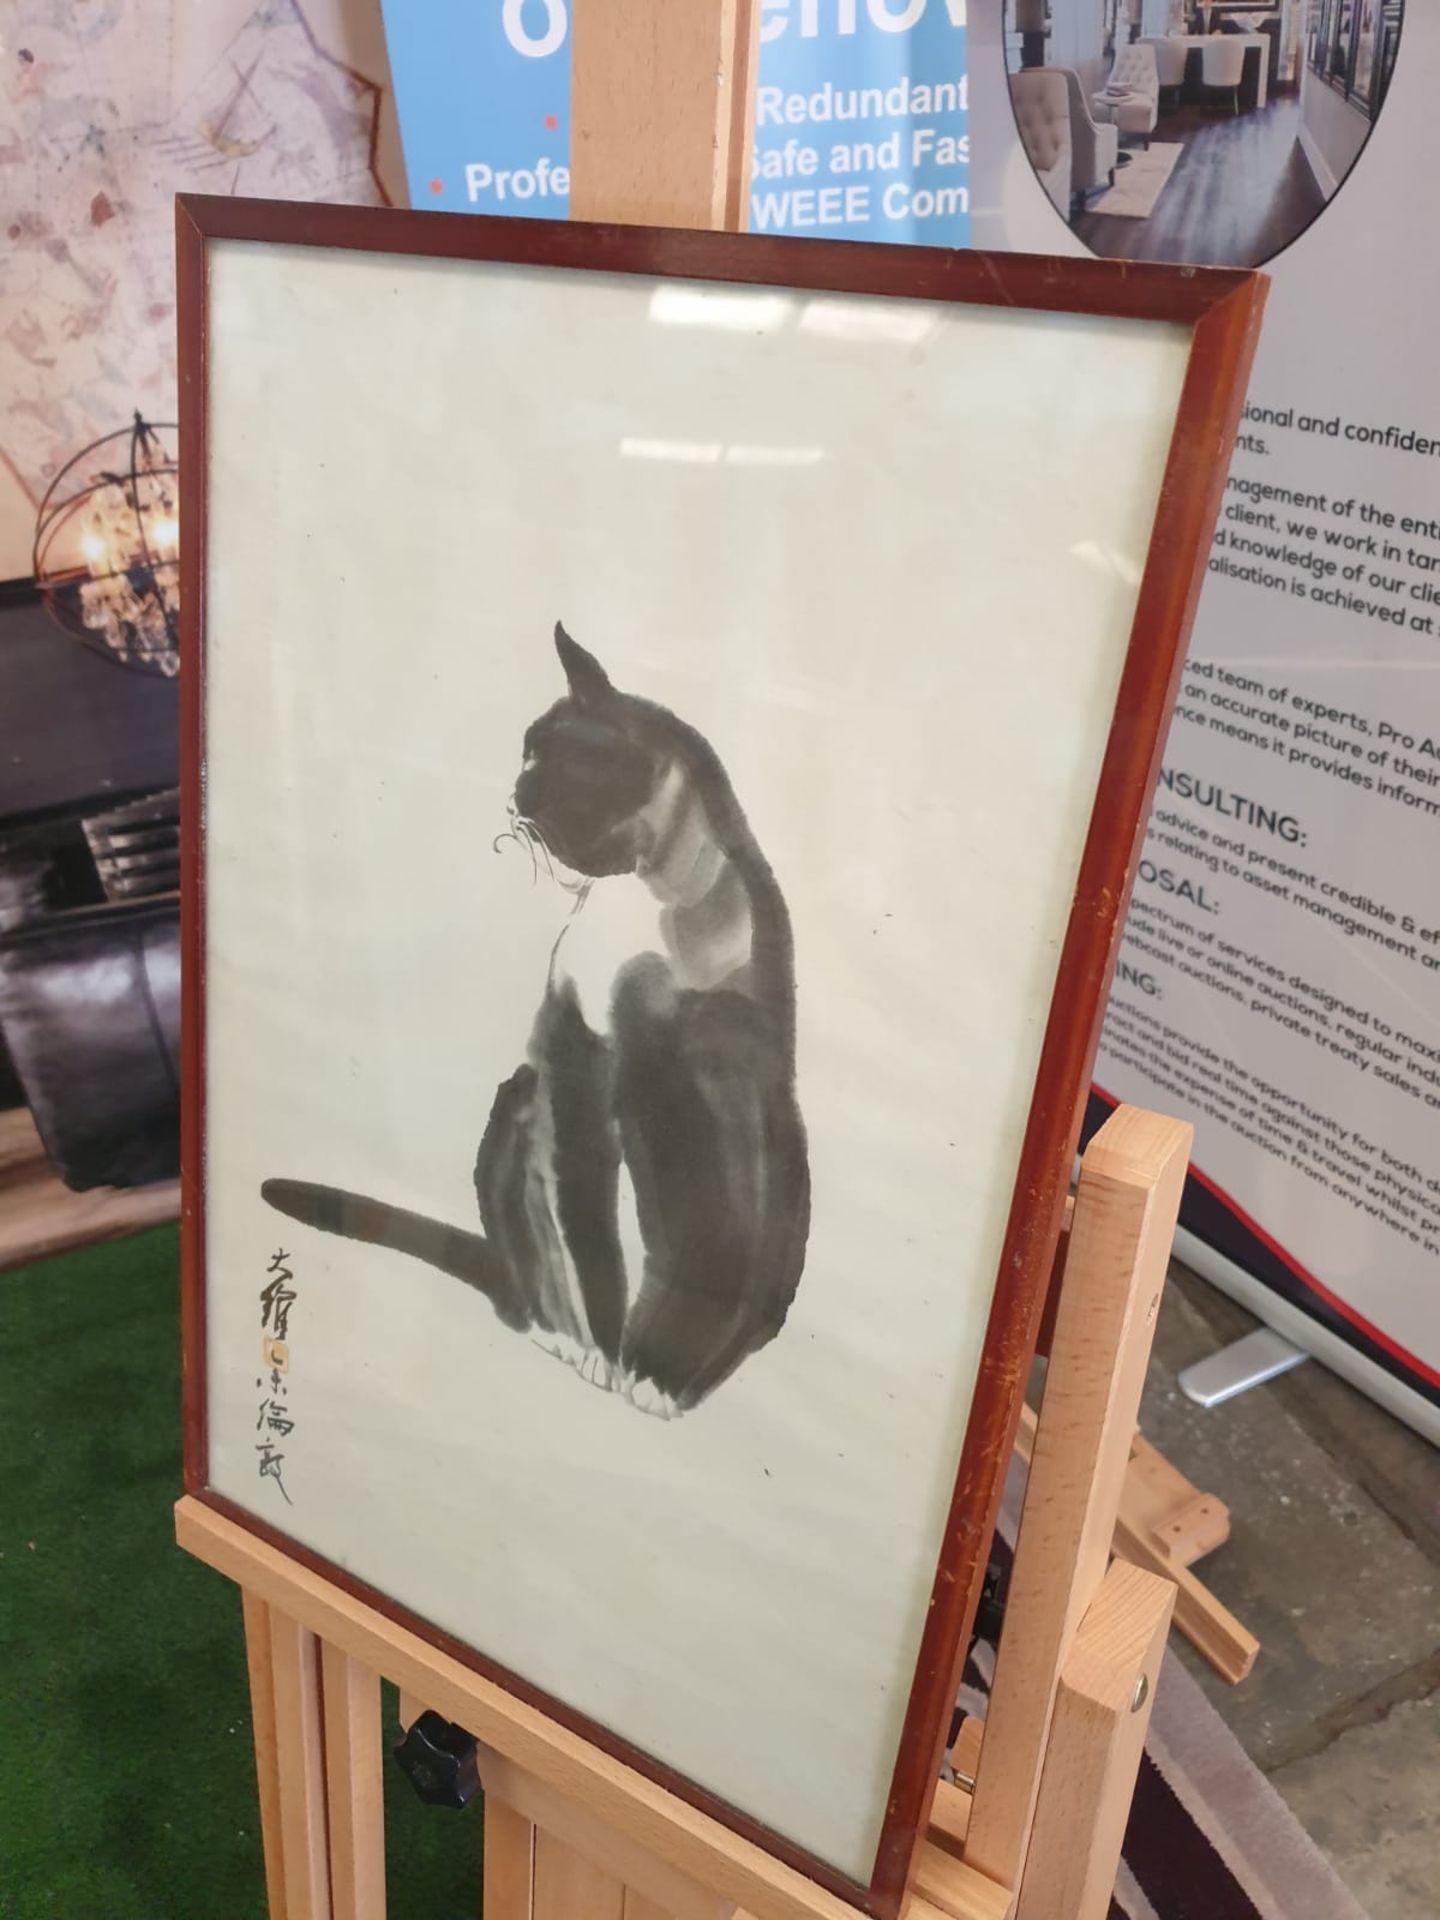 David Kwo Da-Wei (1919-2003) Chinese Lithographic Print Black Cat - Kim Da Wei Kwo, David Kwo 1919-